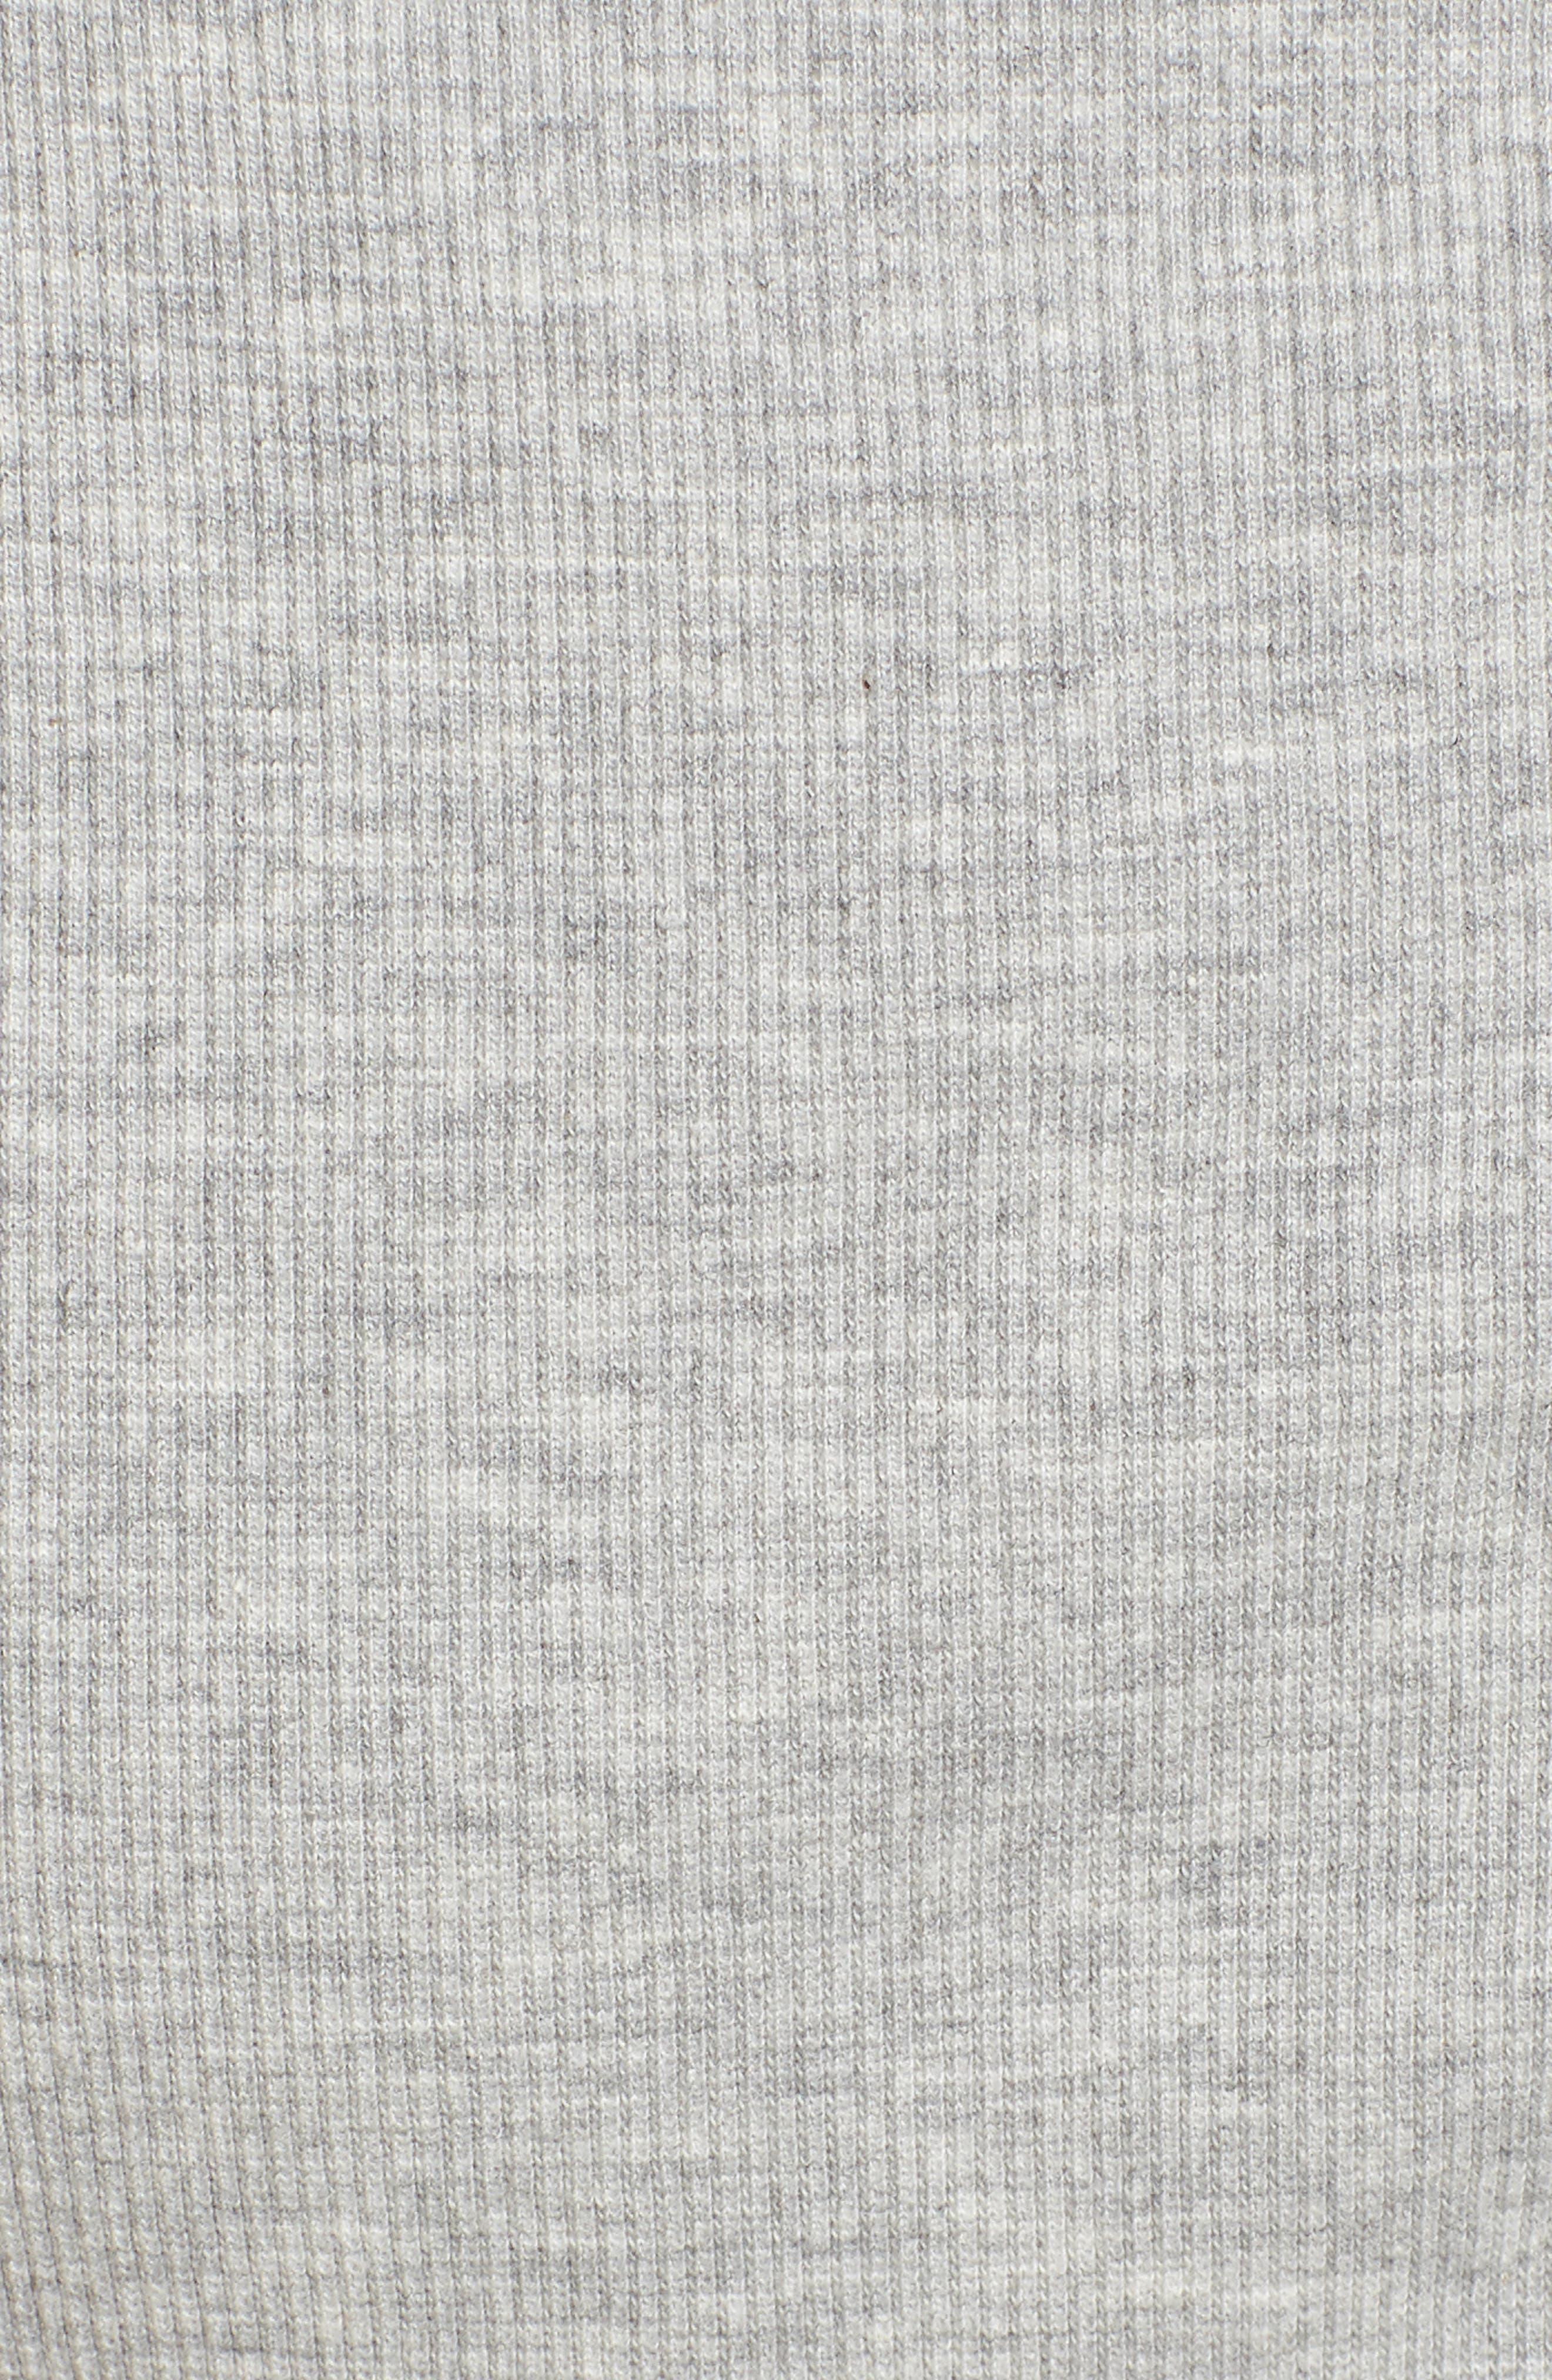 Cross Back Hooded Crop Top,                             Alternate thumbnail 6, color,                             Grey Marl